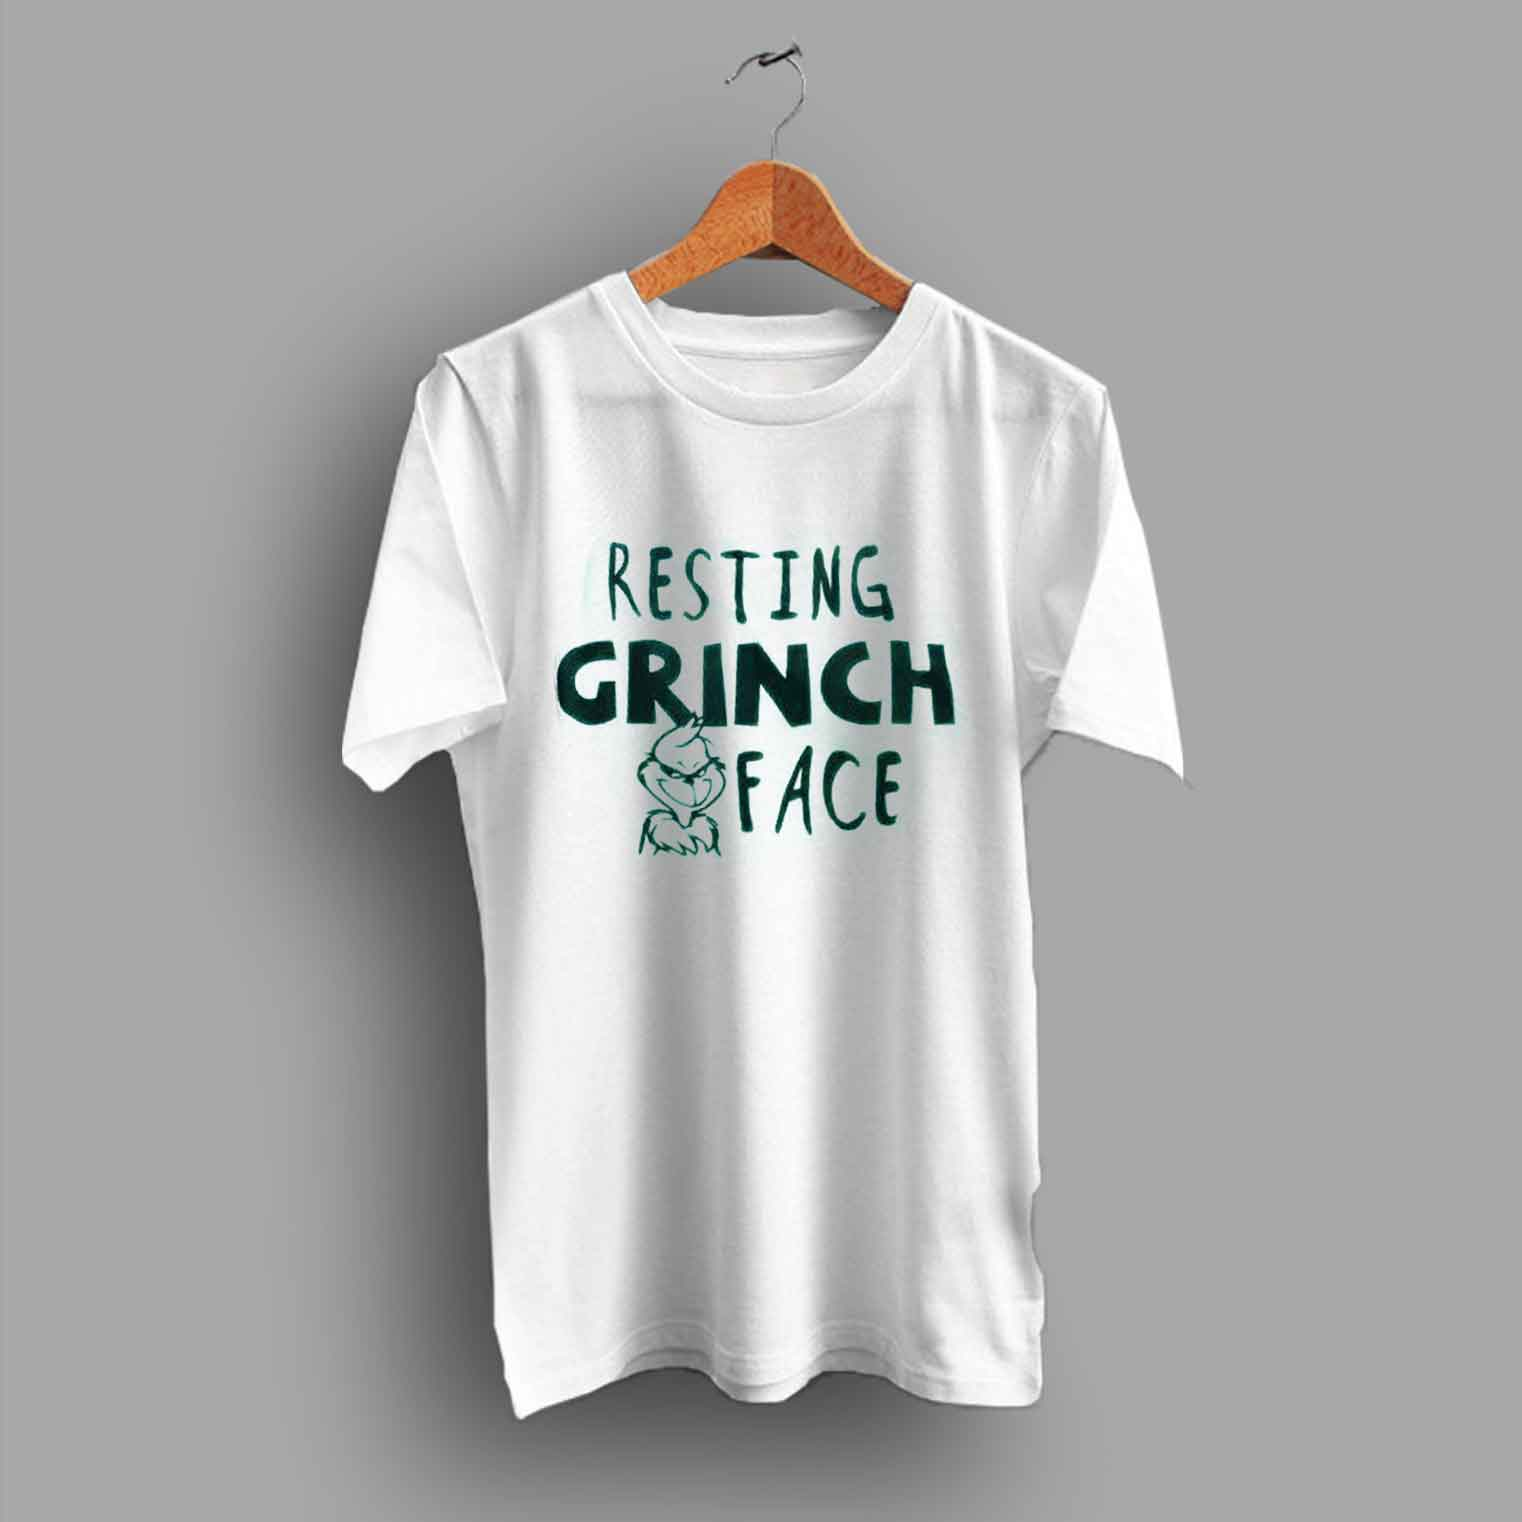 b31abf6ed9b Cheap Resting Grinch Face Christmas T Shirt - HotVero.com